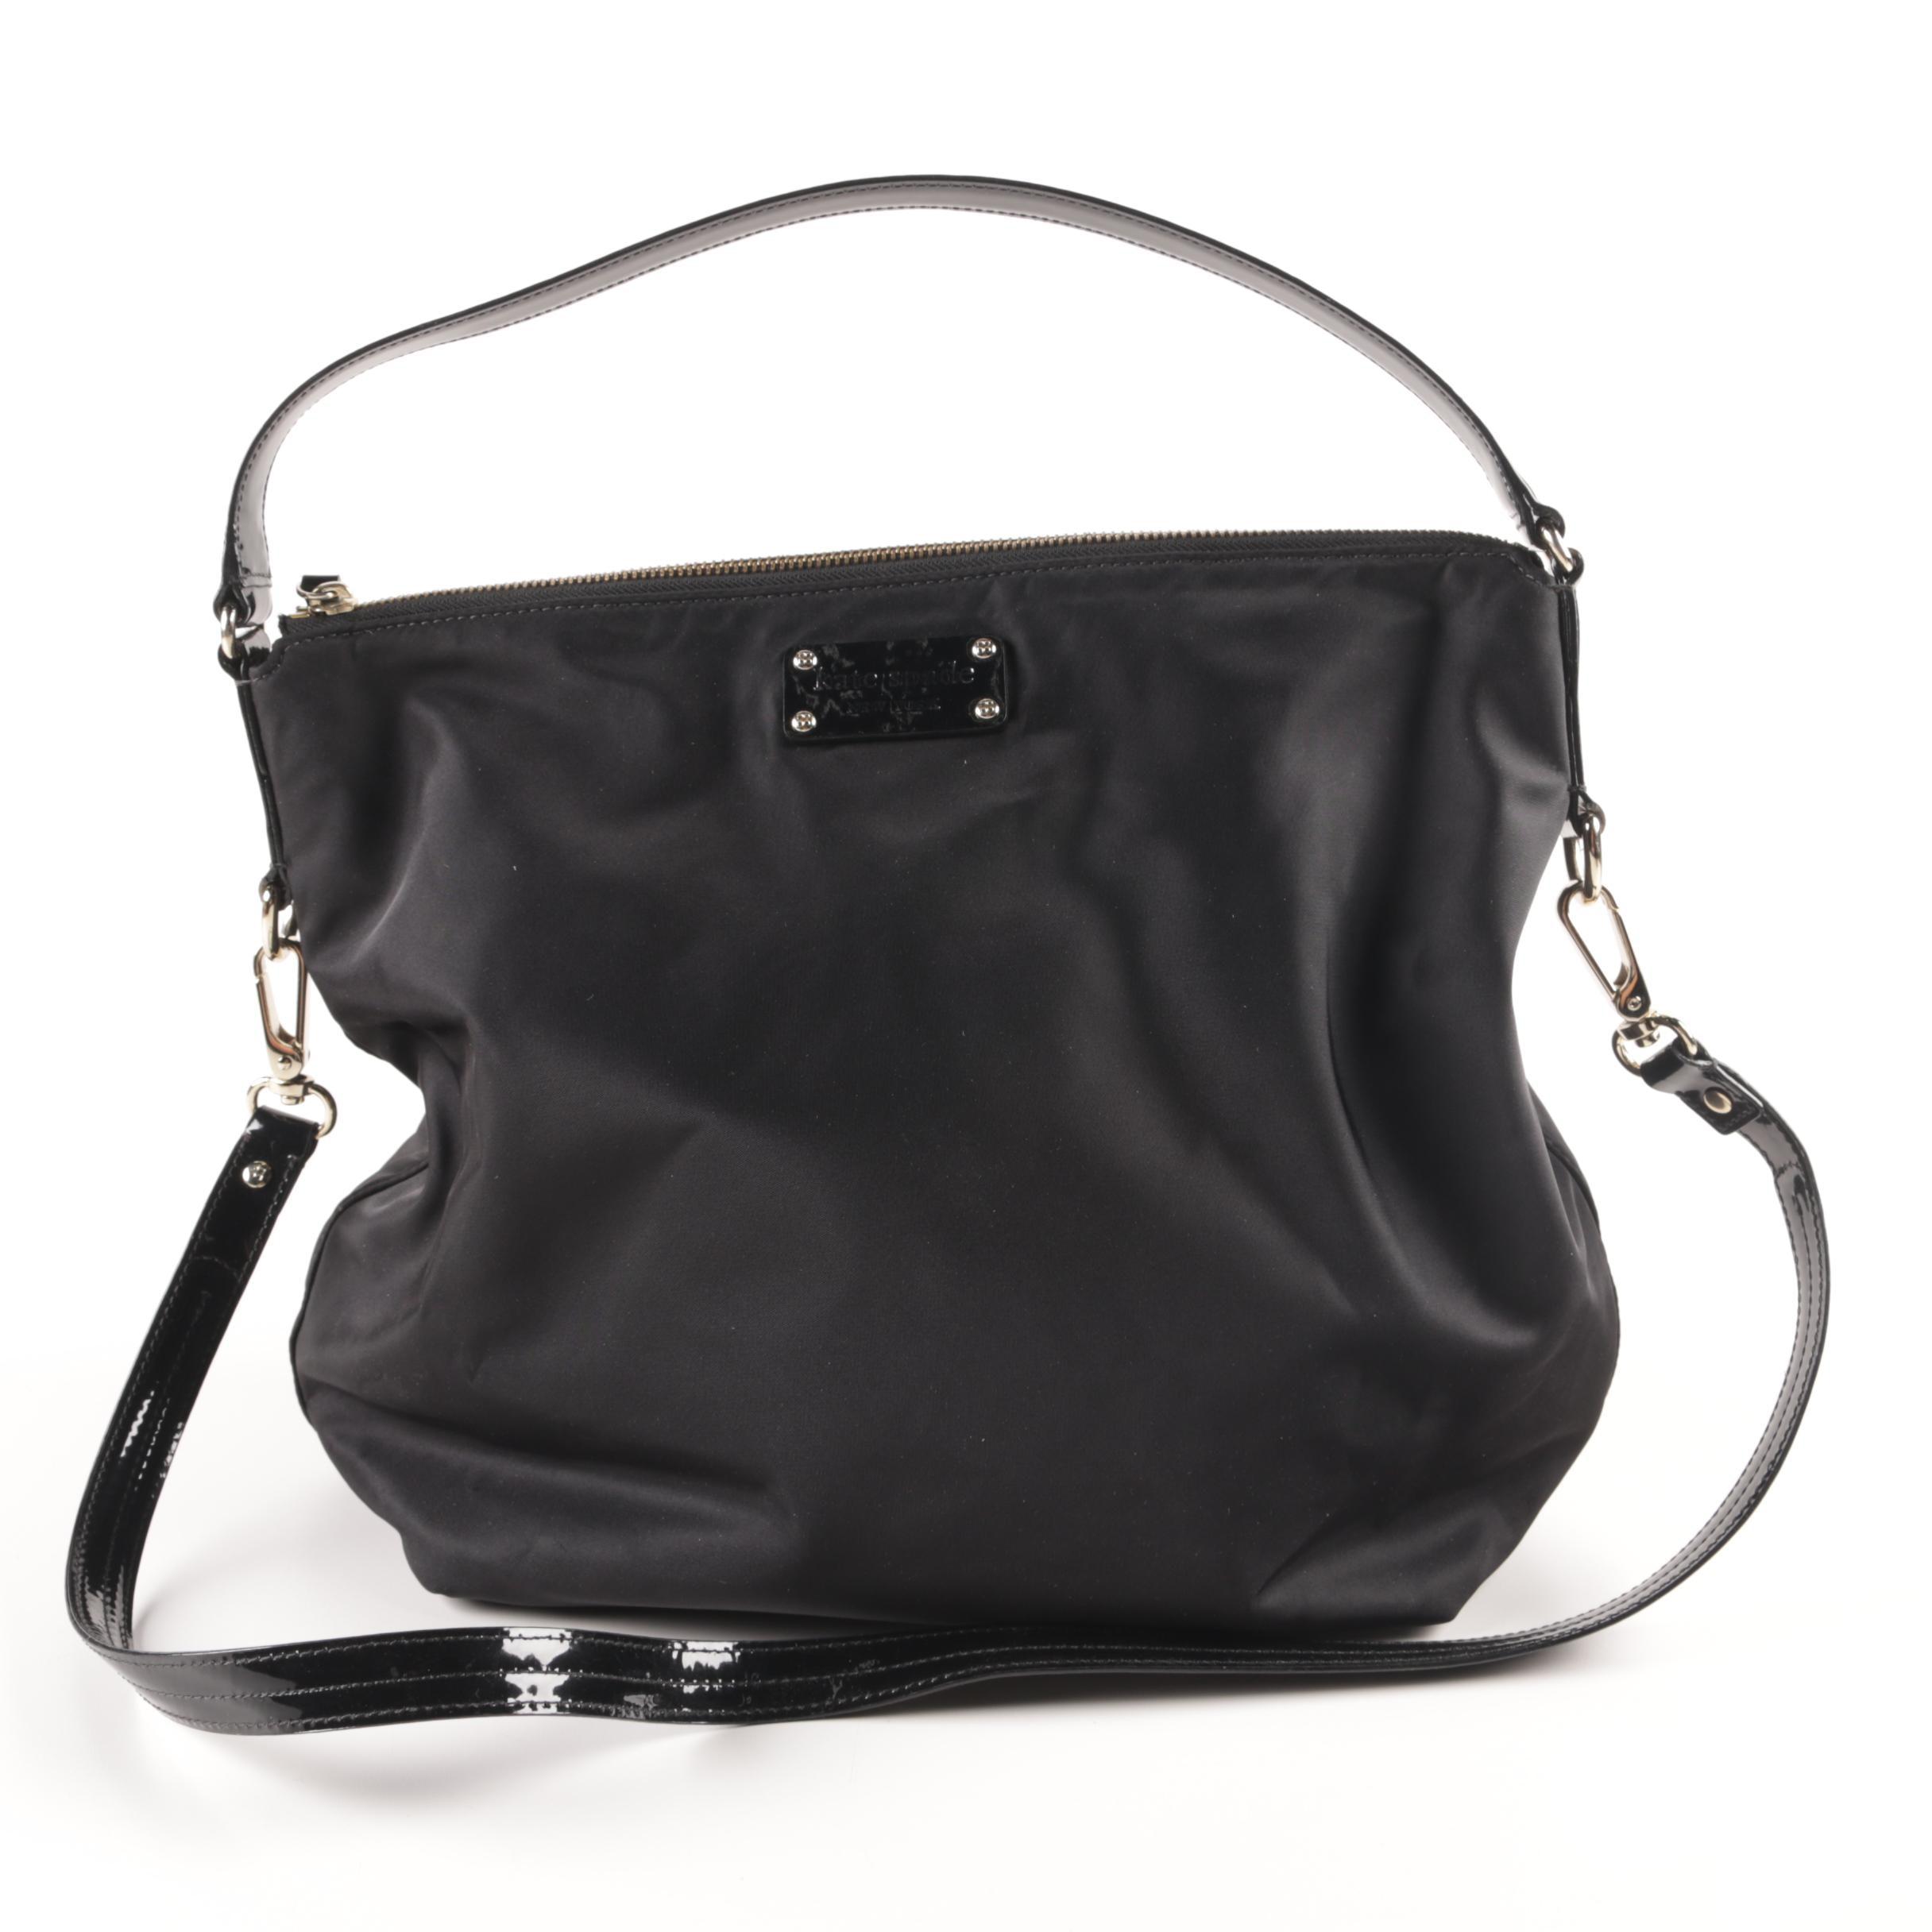 Kate Spade Mini Maria Black Nylon and Patent Leather Handbag